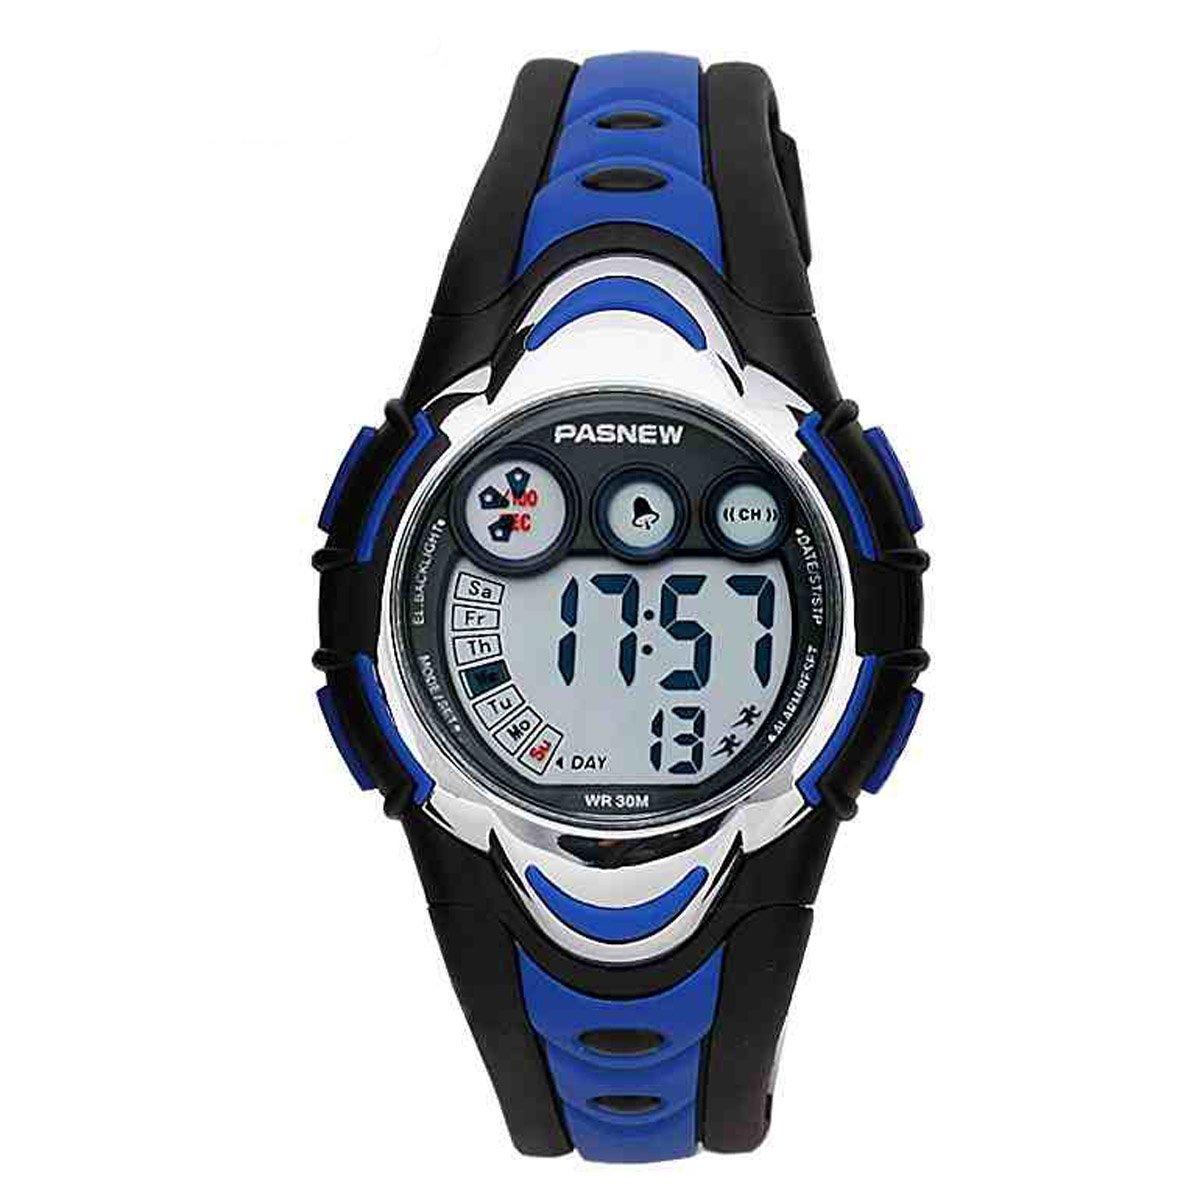 BesWlz Sports Kids LED Digital Alarm Stopwatch Waterproof Wristwatch for Child Boys Girls (Blue)